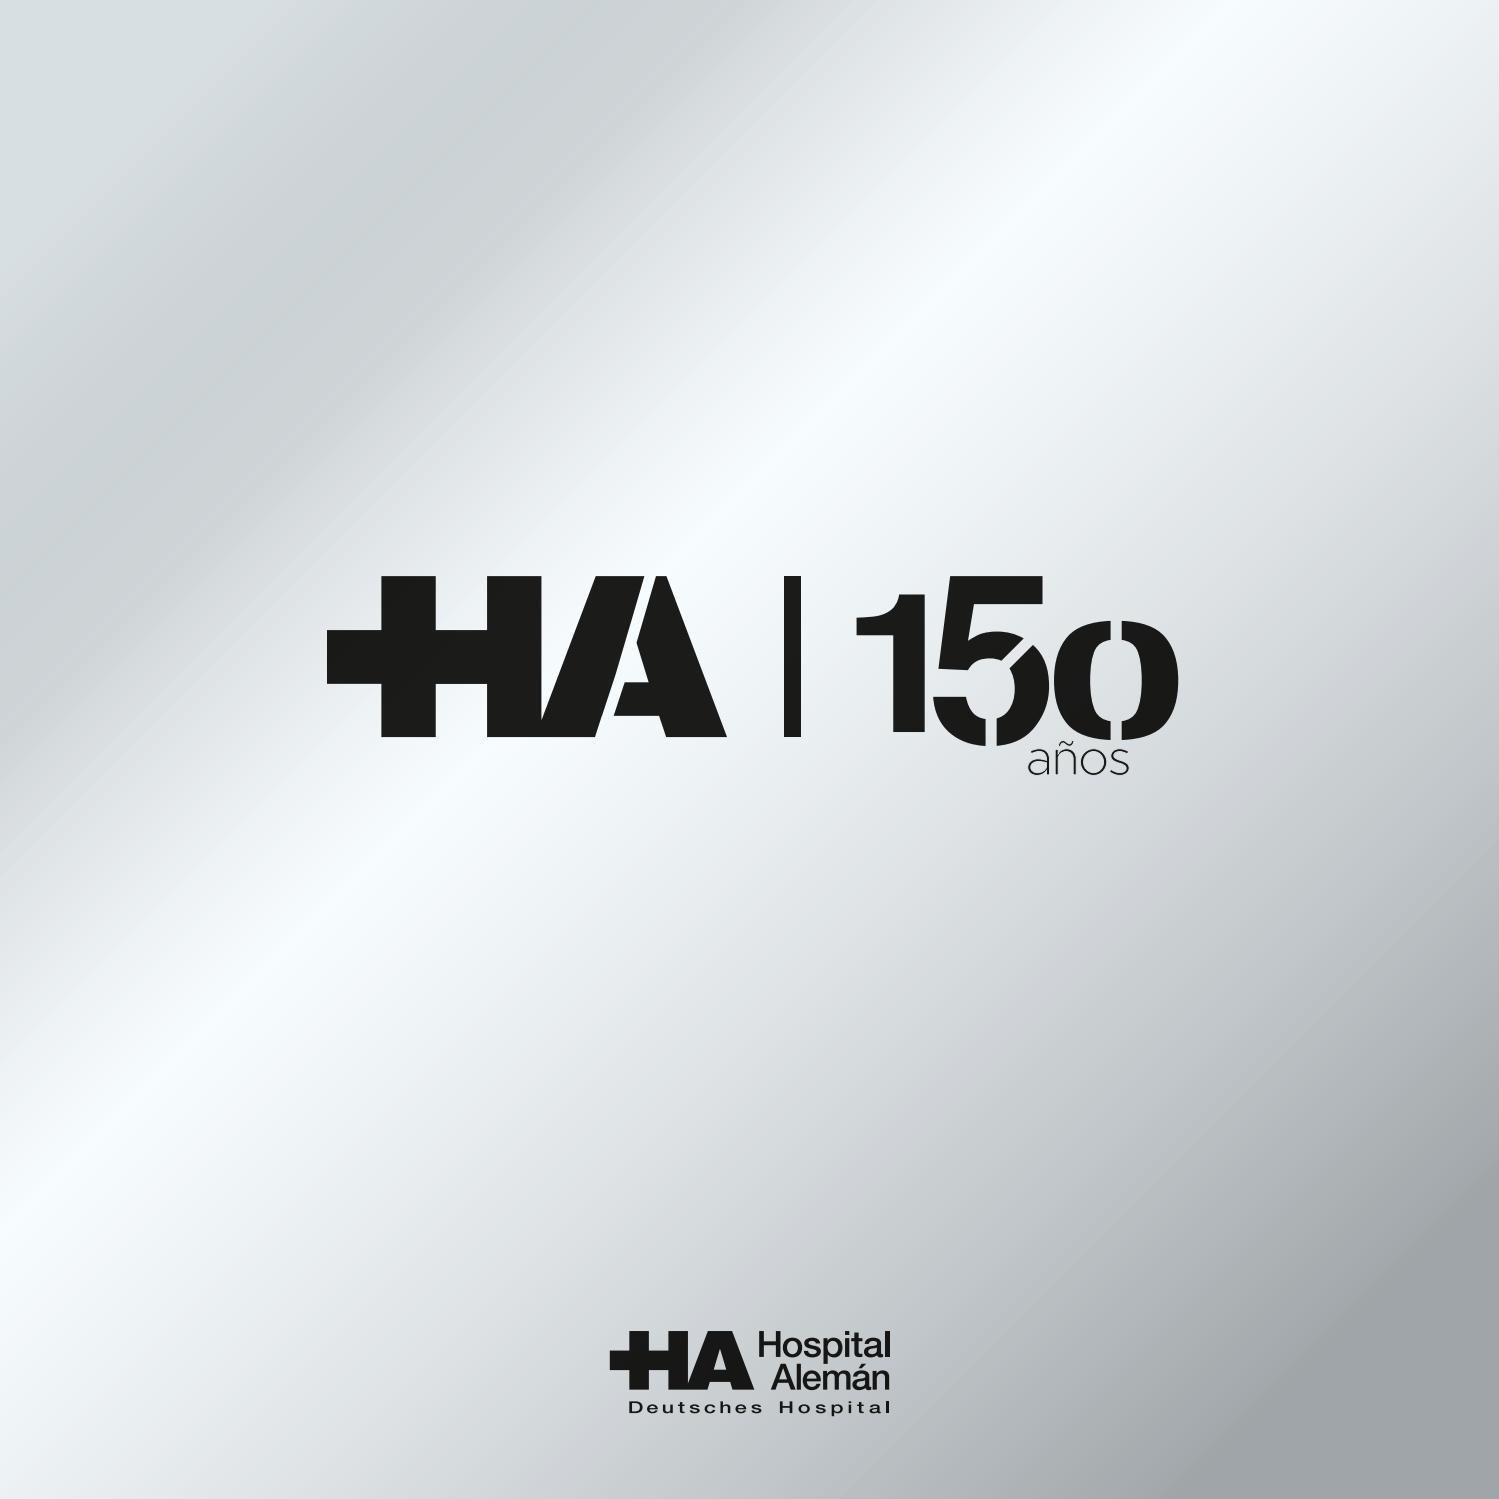 Hospital Alemán - Libro 150° aniversario by Esfera Gráfica - issuu